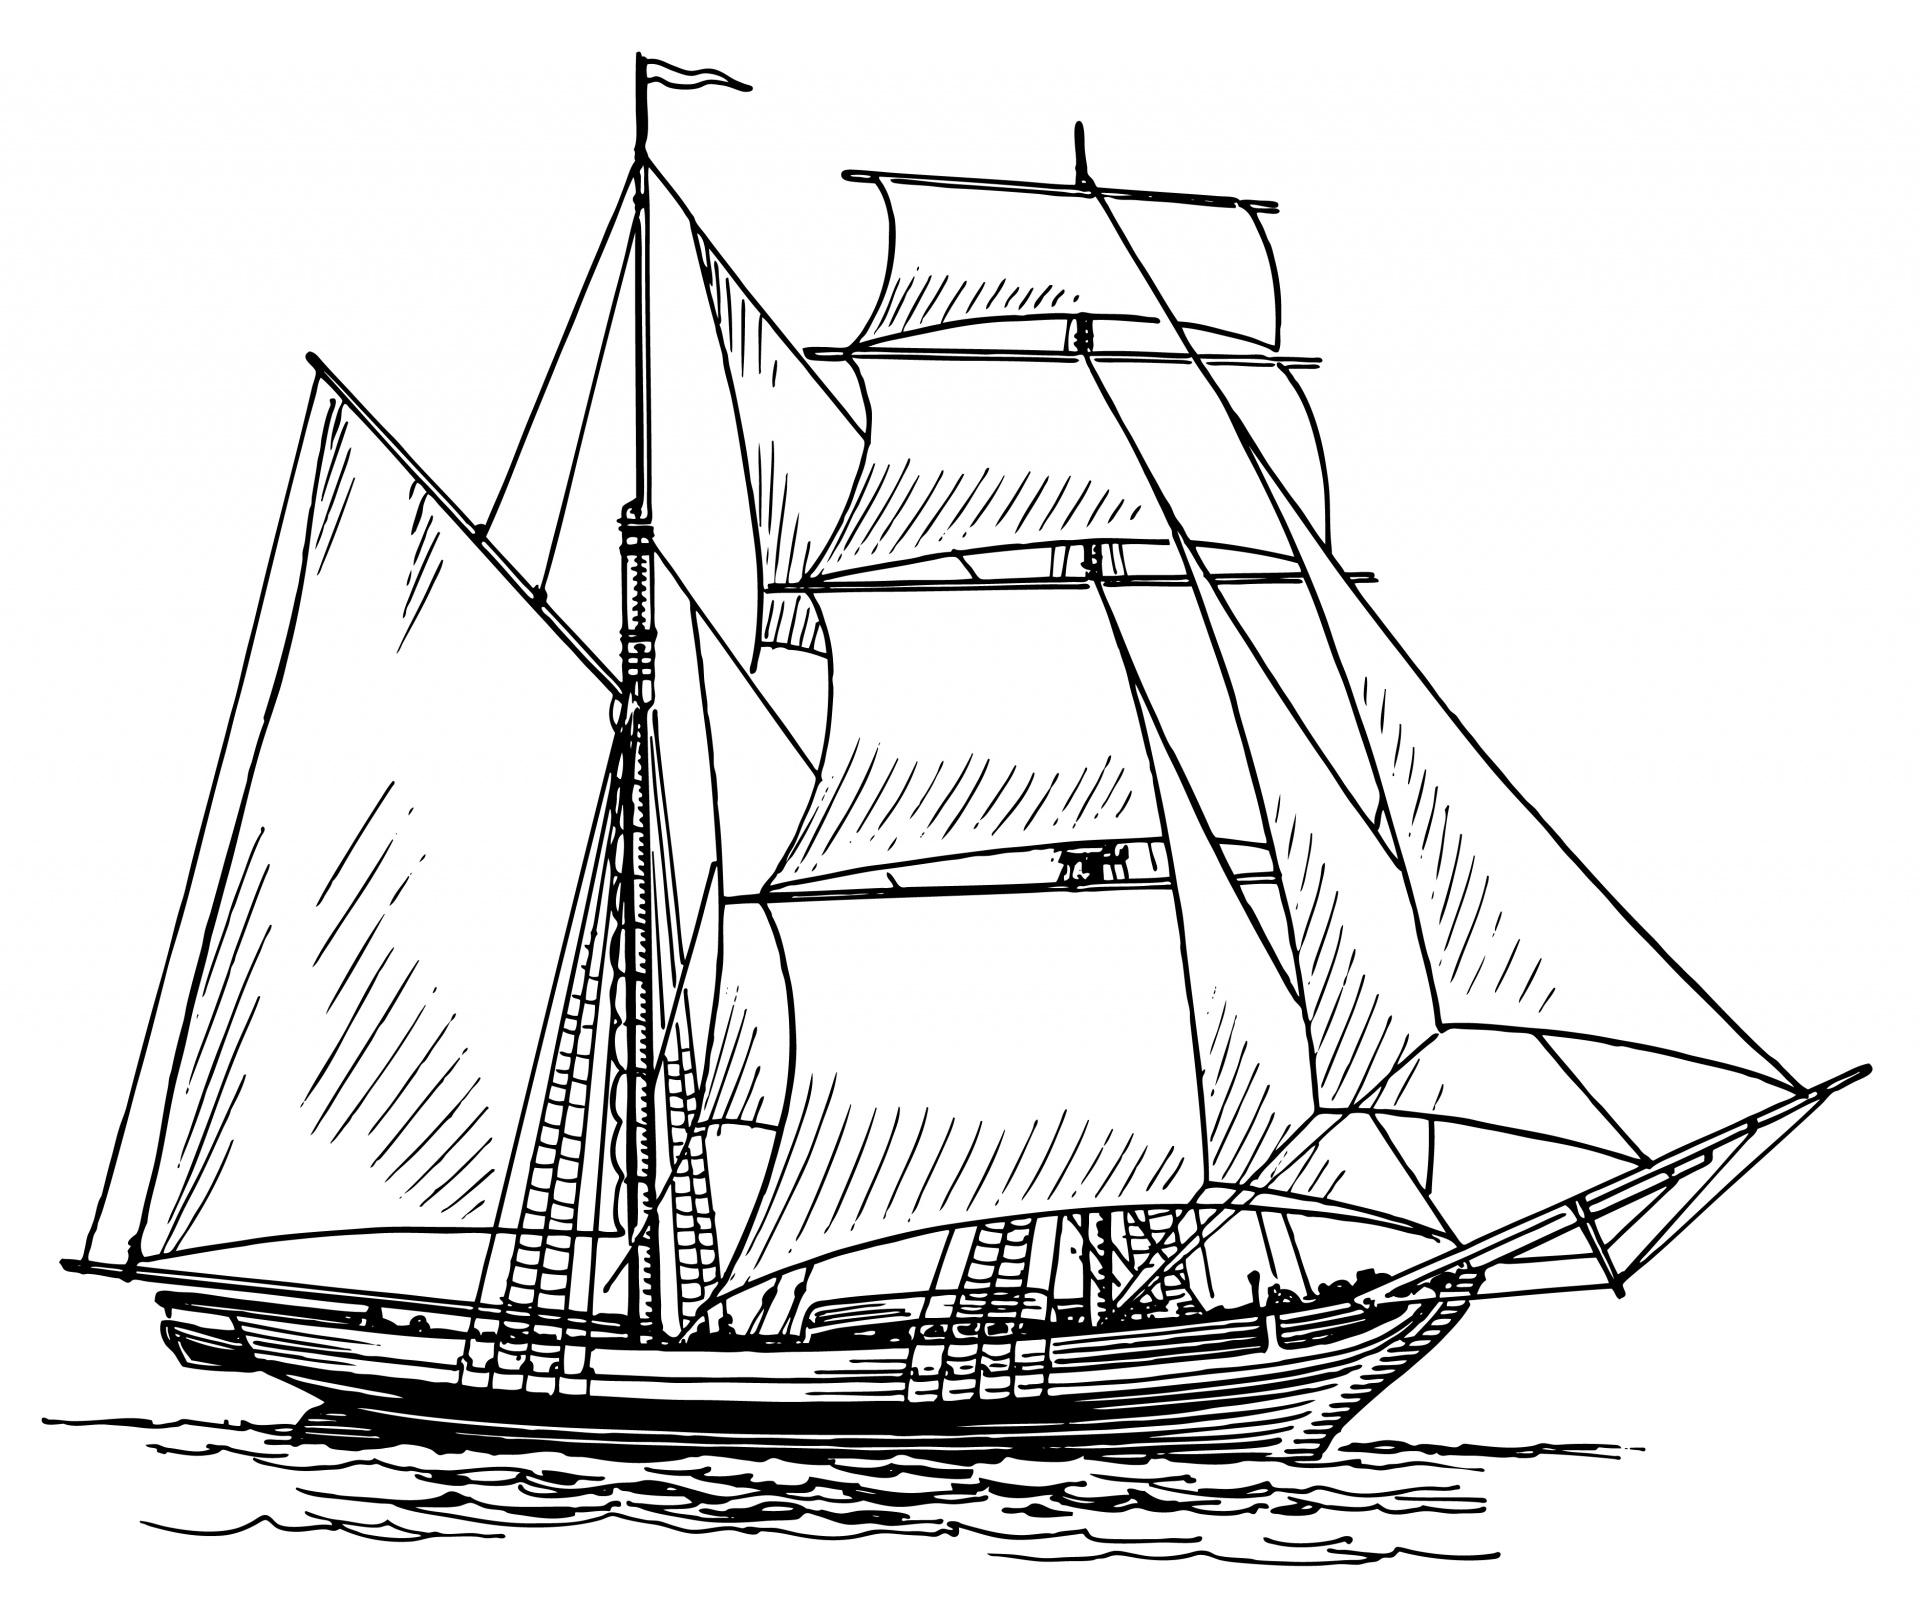 Boat clipart sailing boat. Ship illustration free stock